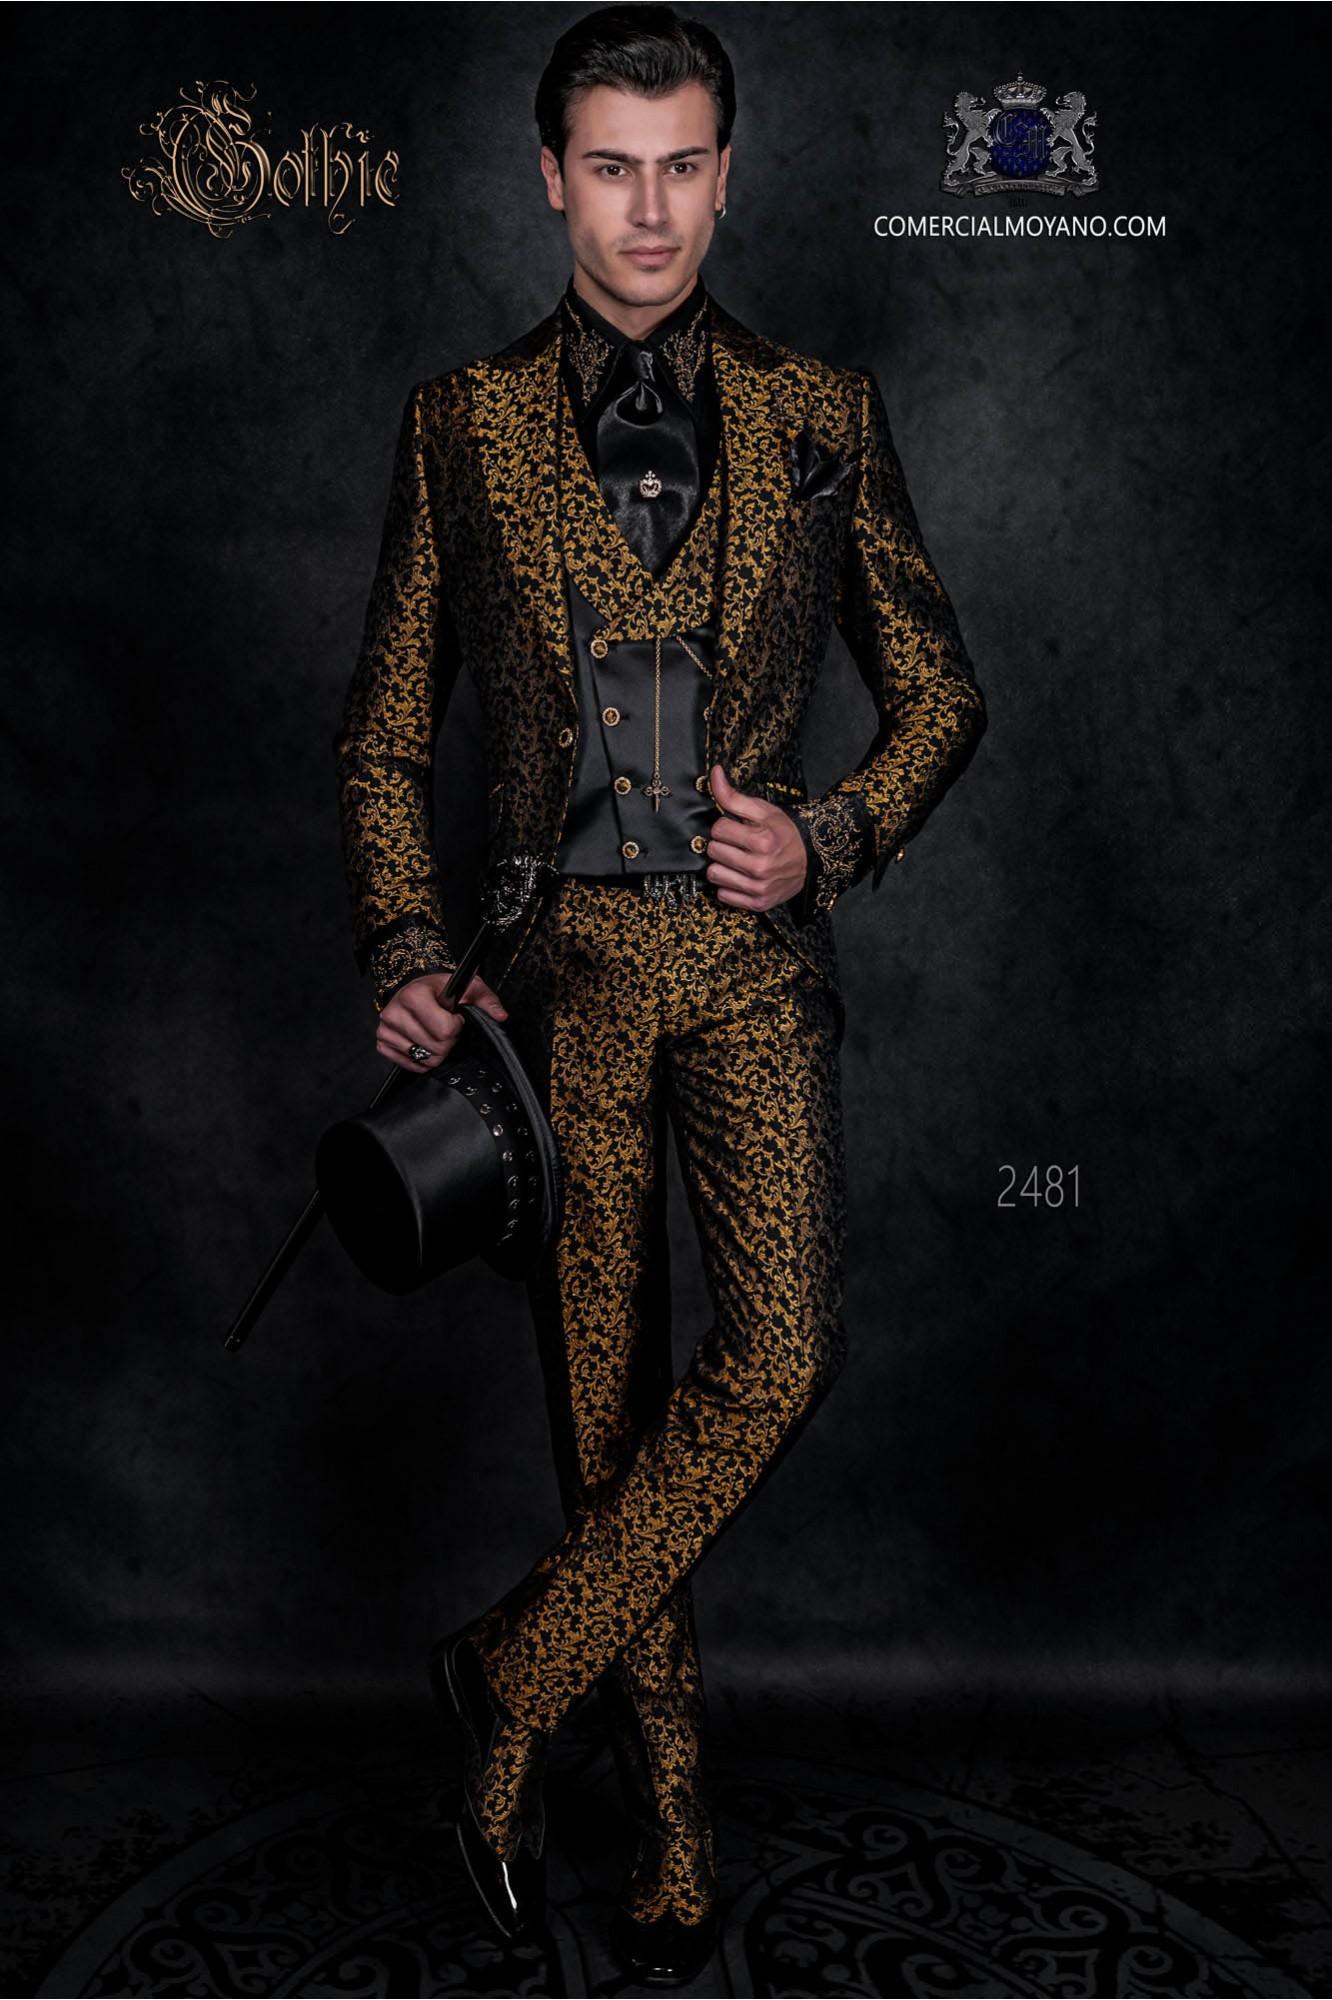 Traje de época estilo gótico brocado negro y oro redingote de novio